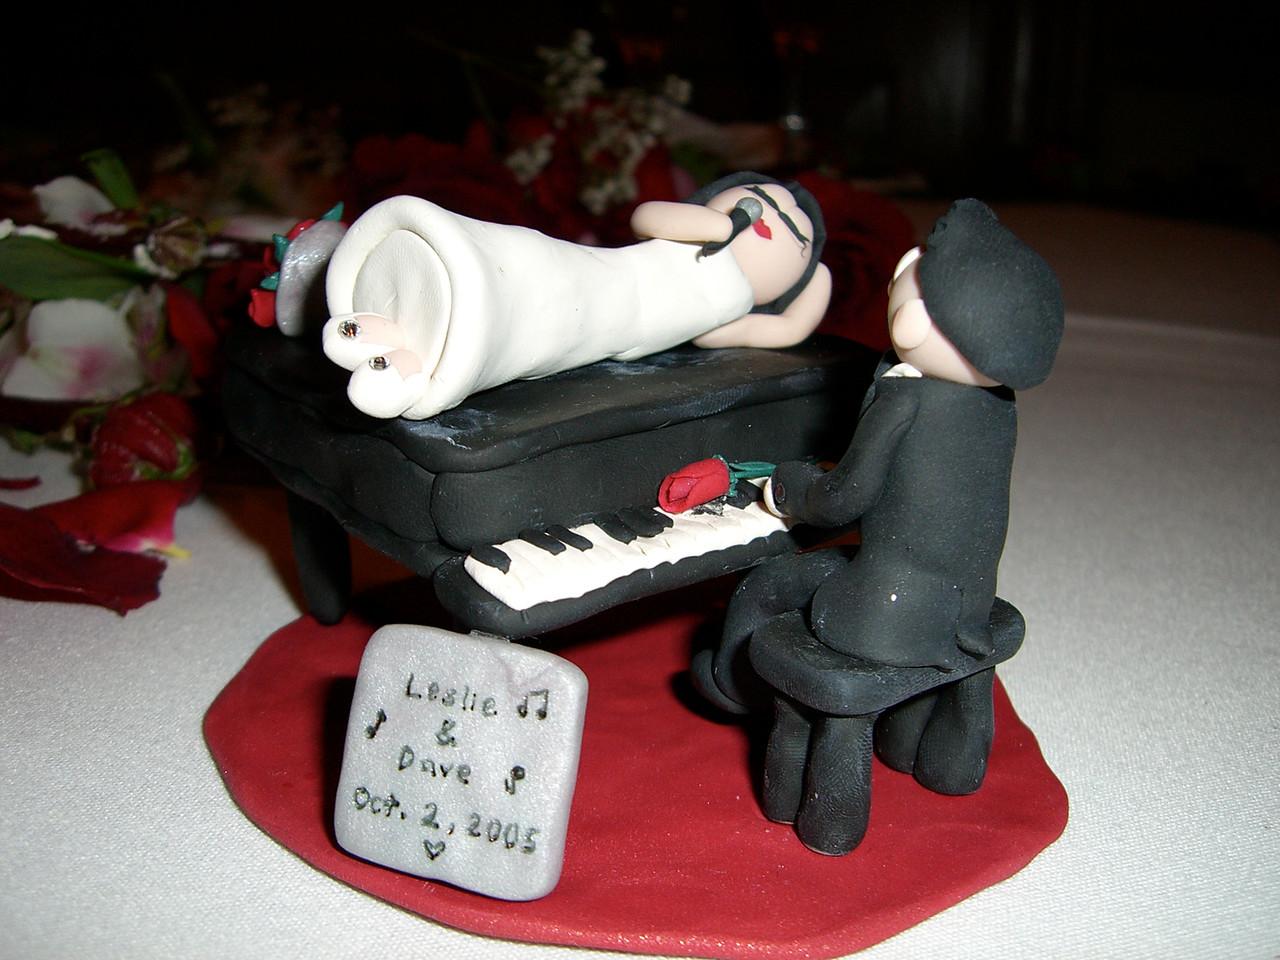 Jessica Low's Custom Cake Ornament - with flash